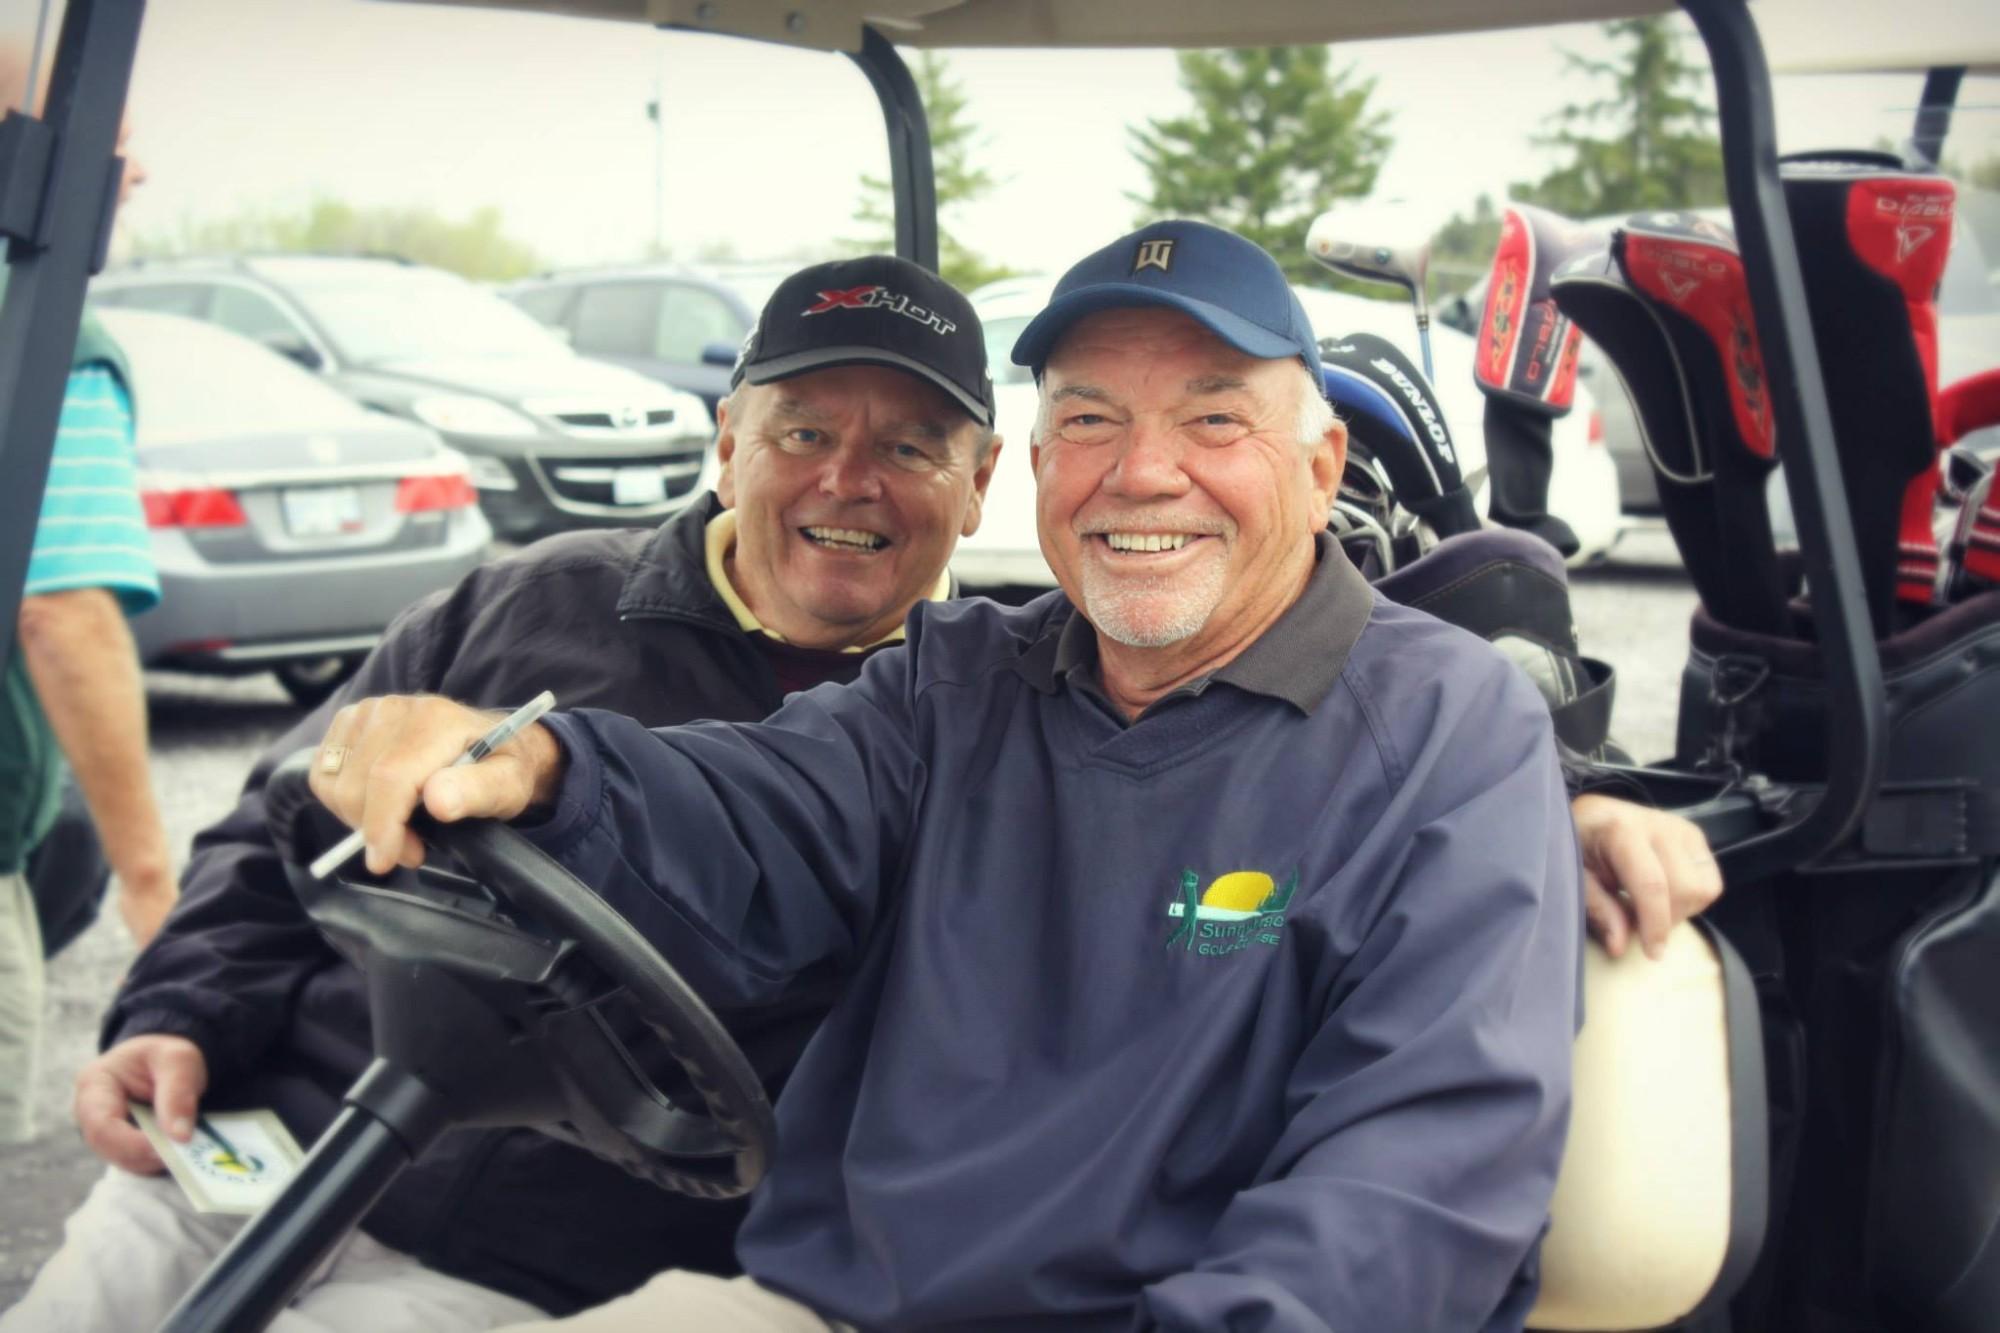 Golf League Men Sunnybrae Golf Club Port Perry